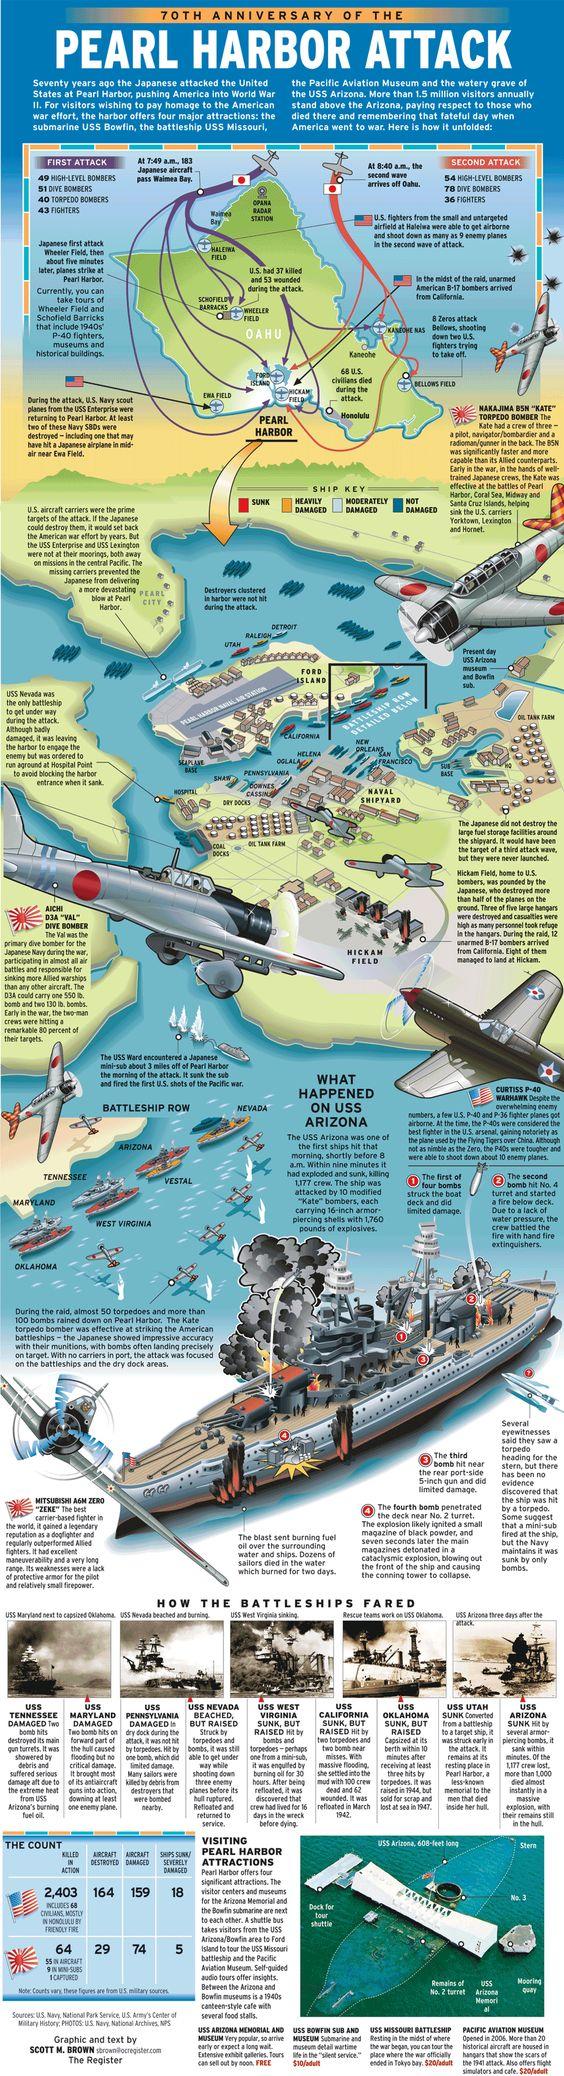 Remembering 'Remember Pearl Harbor' | pearl, remember, remembering - The Orange County Register